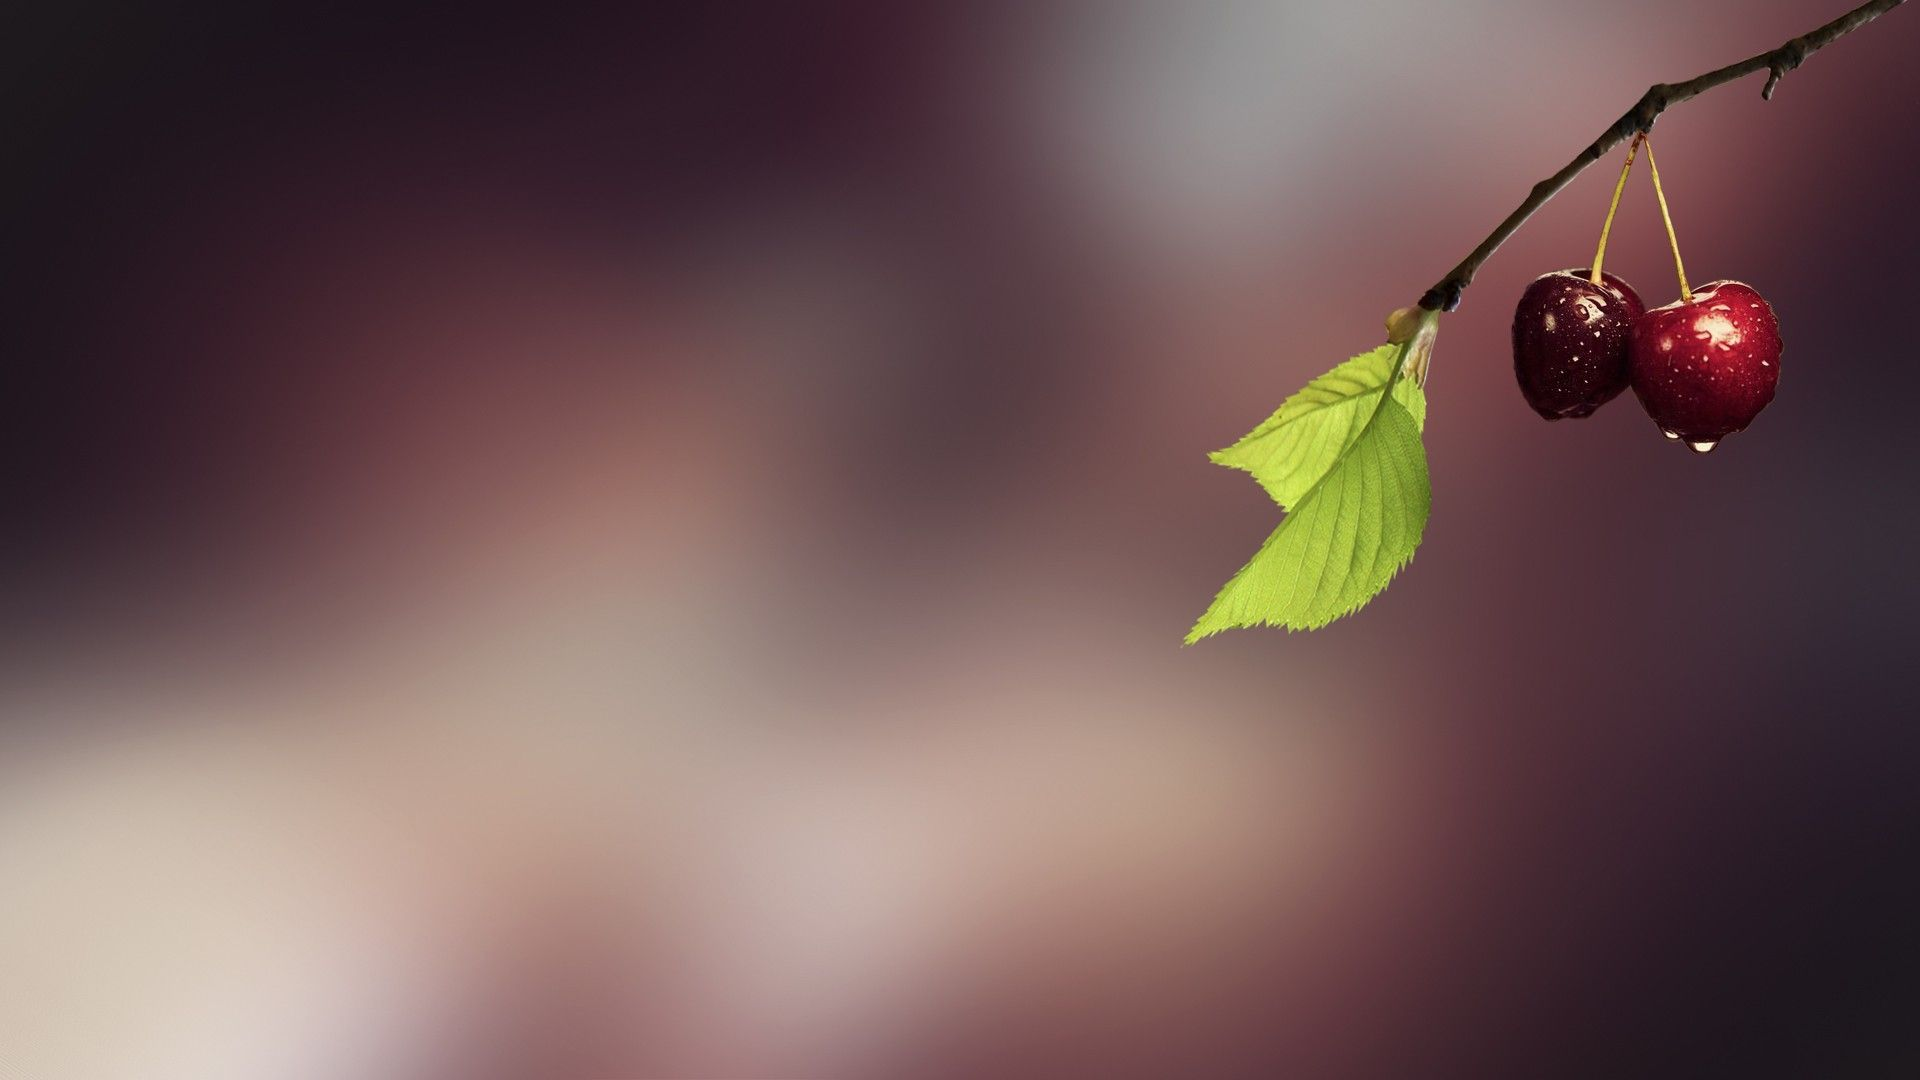 Macro Cherry Hd 1080p Wallpapers Download 1080p Wallpaper